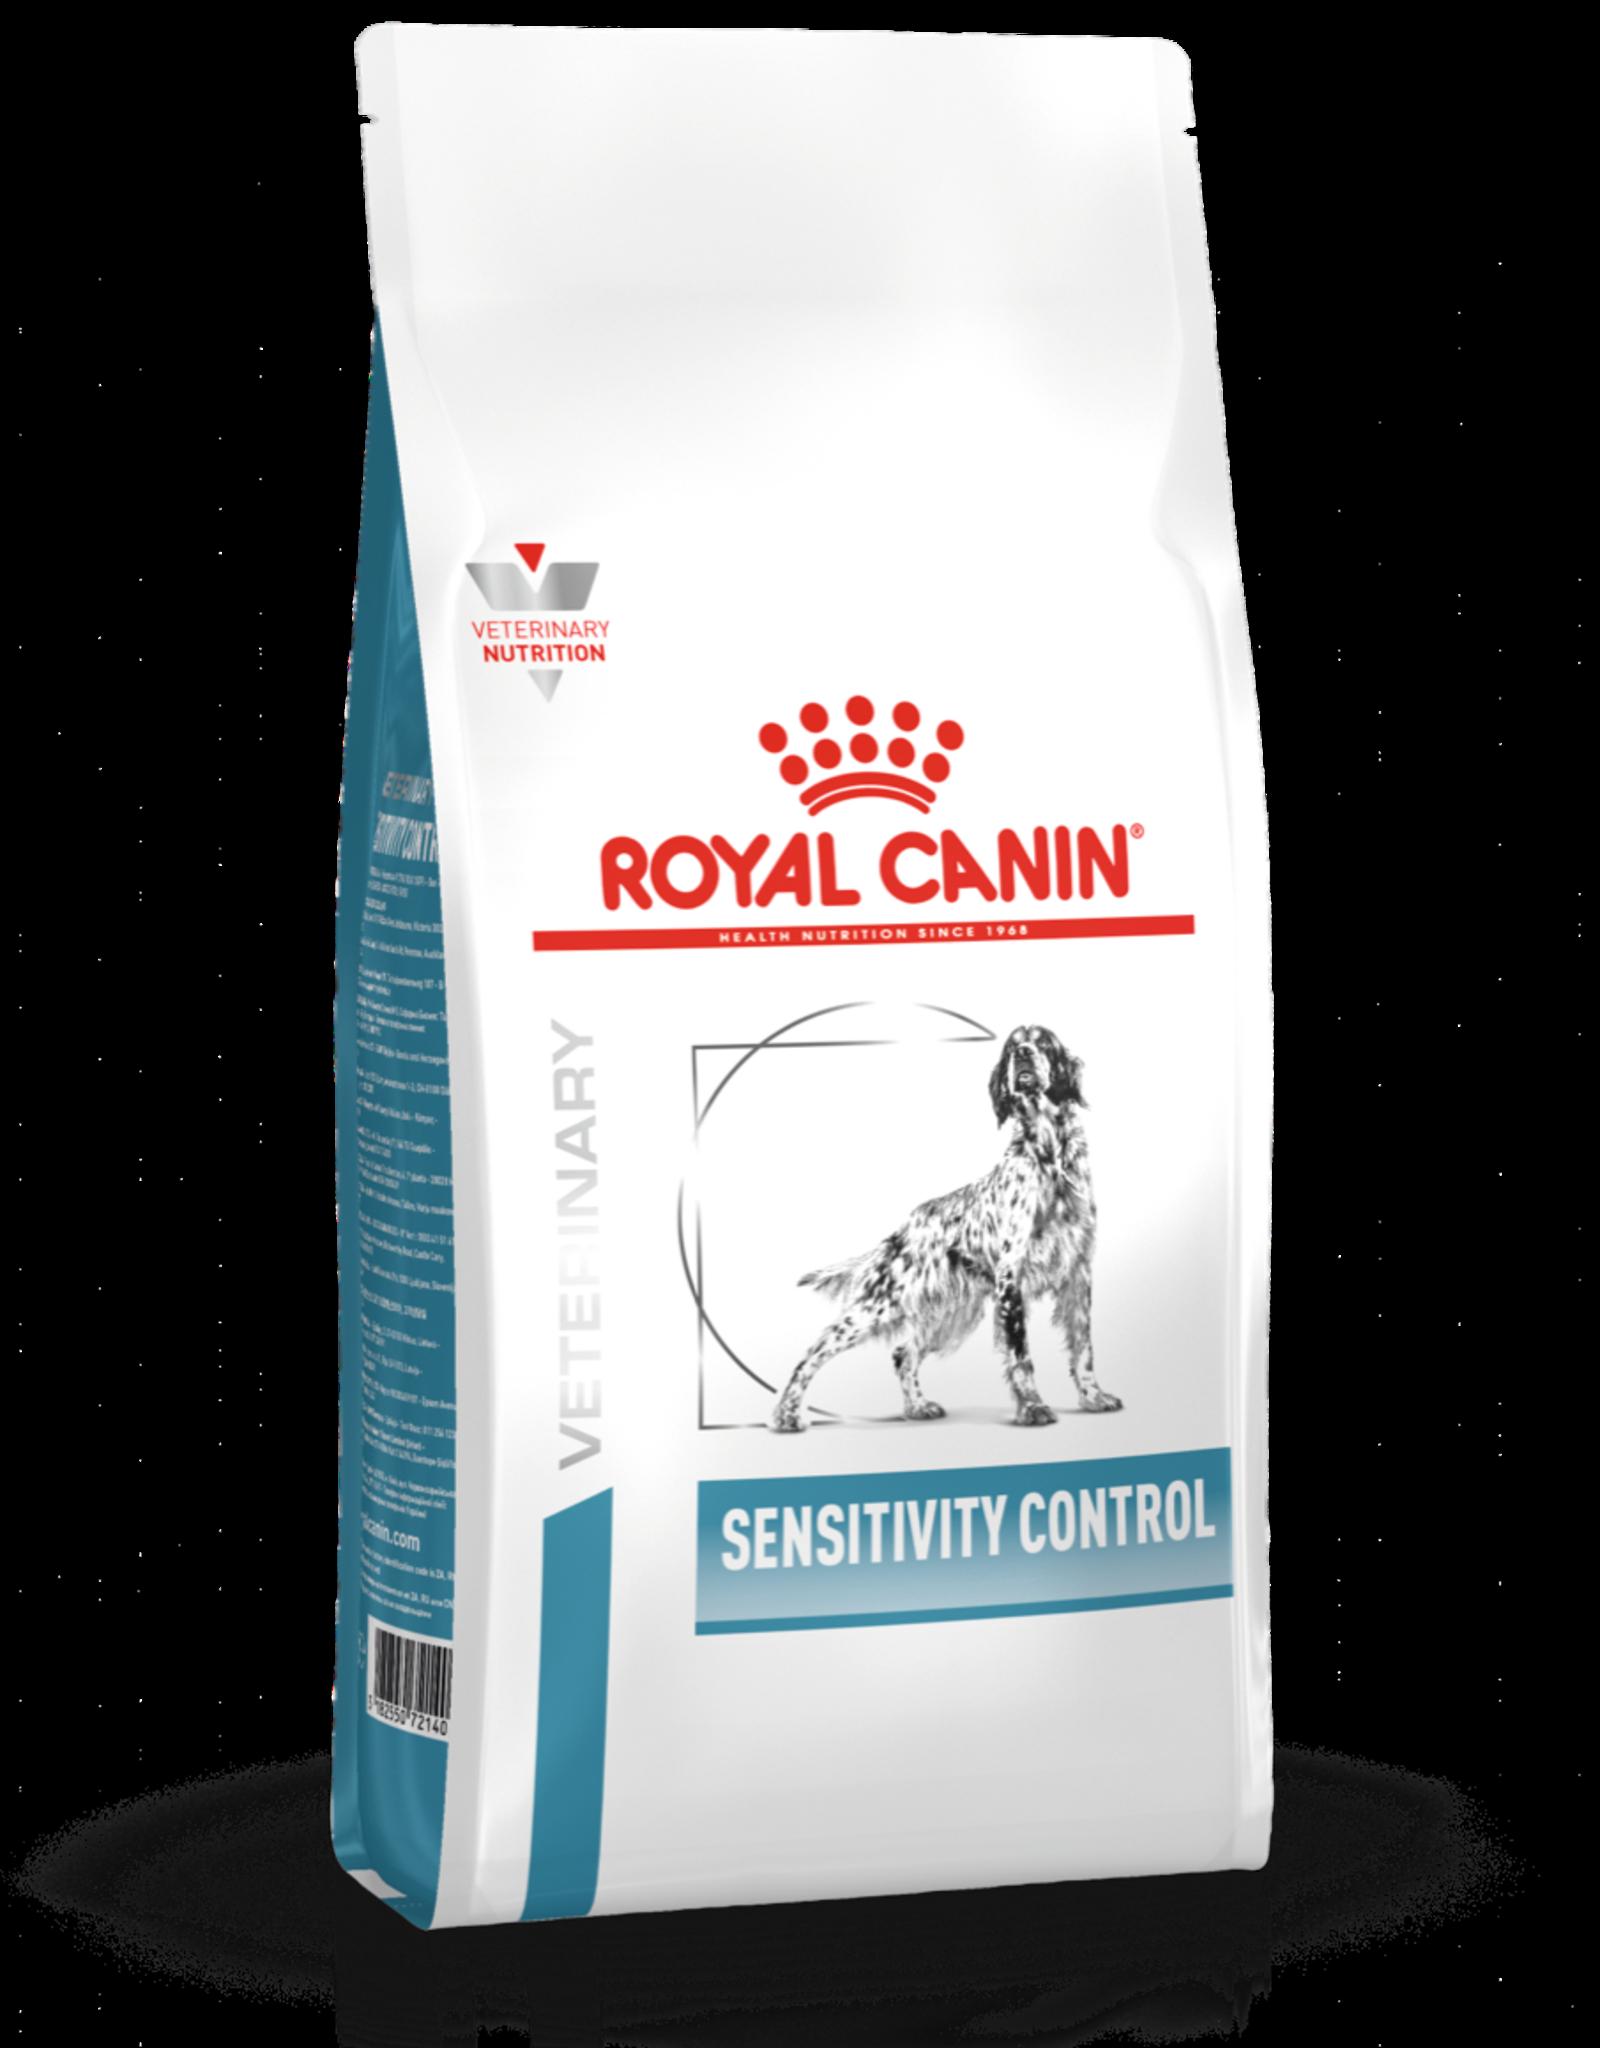 Royal Canin Royal Canin Sensitivity Control Dog Duck 1,5kg